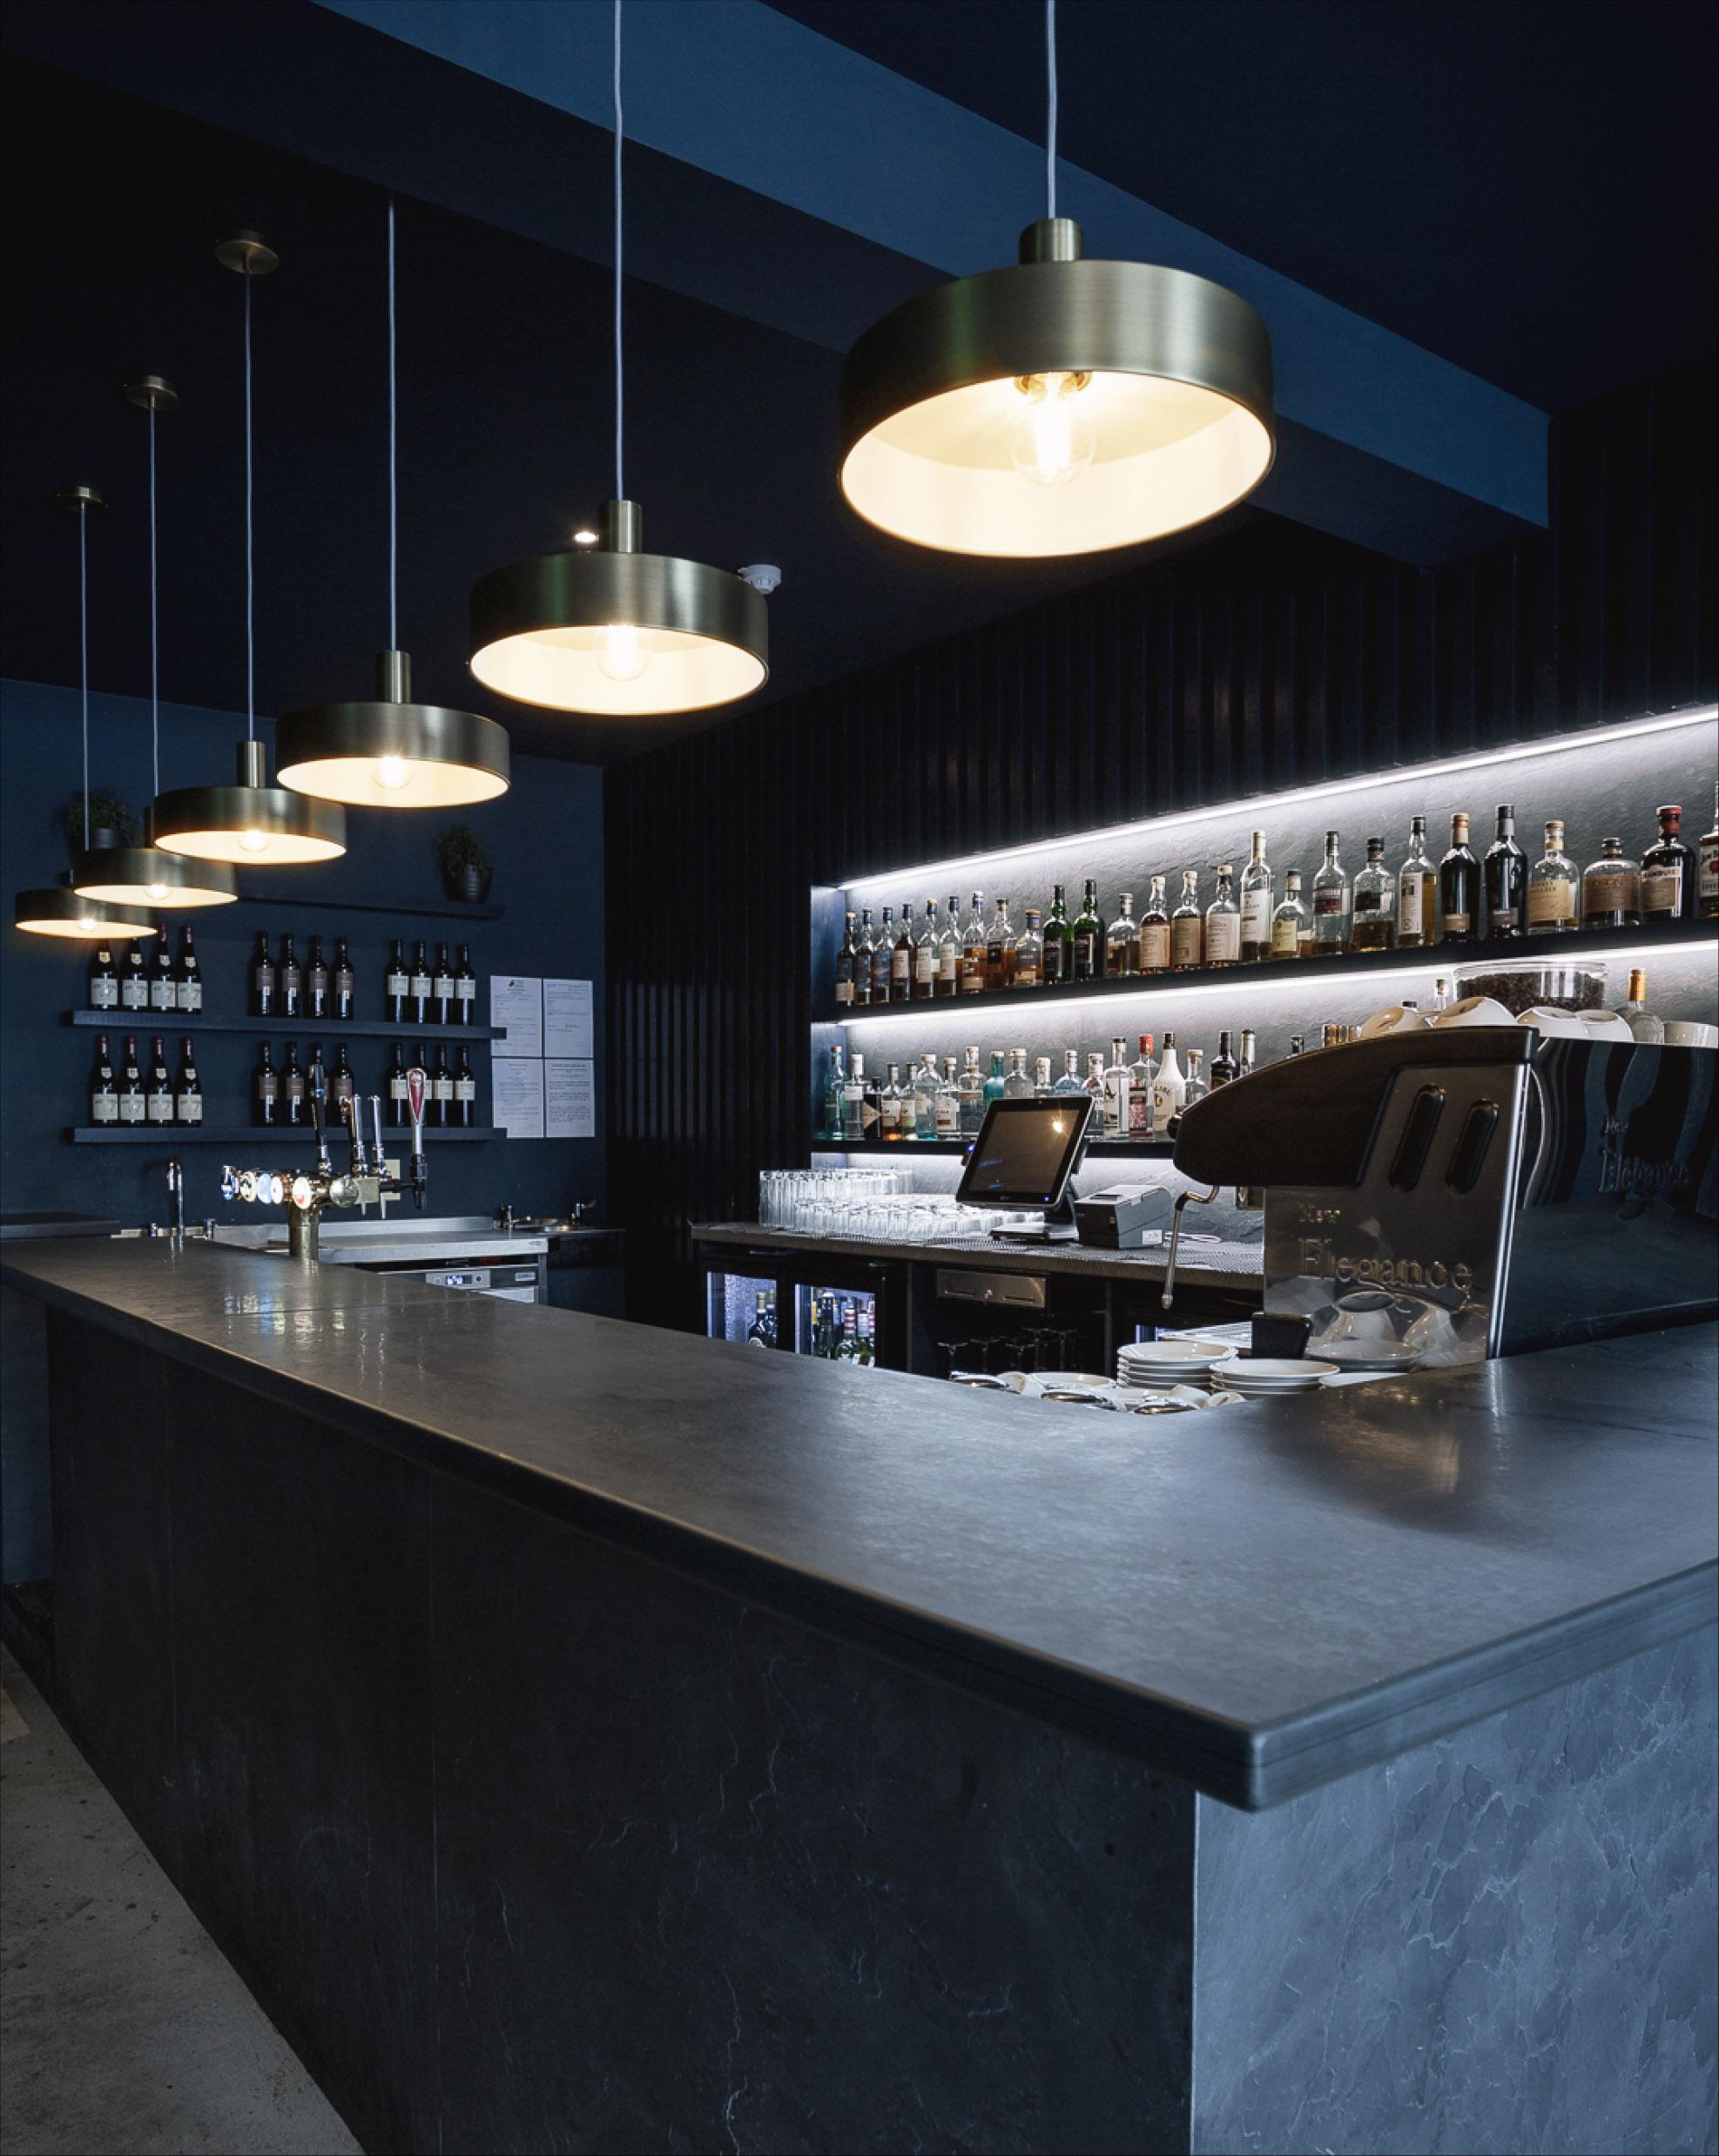 caroy-house_skye_hotel-bar_reservations.jpg